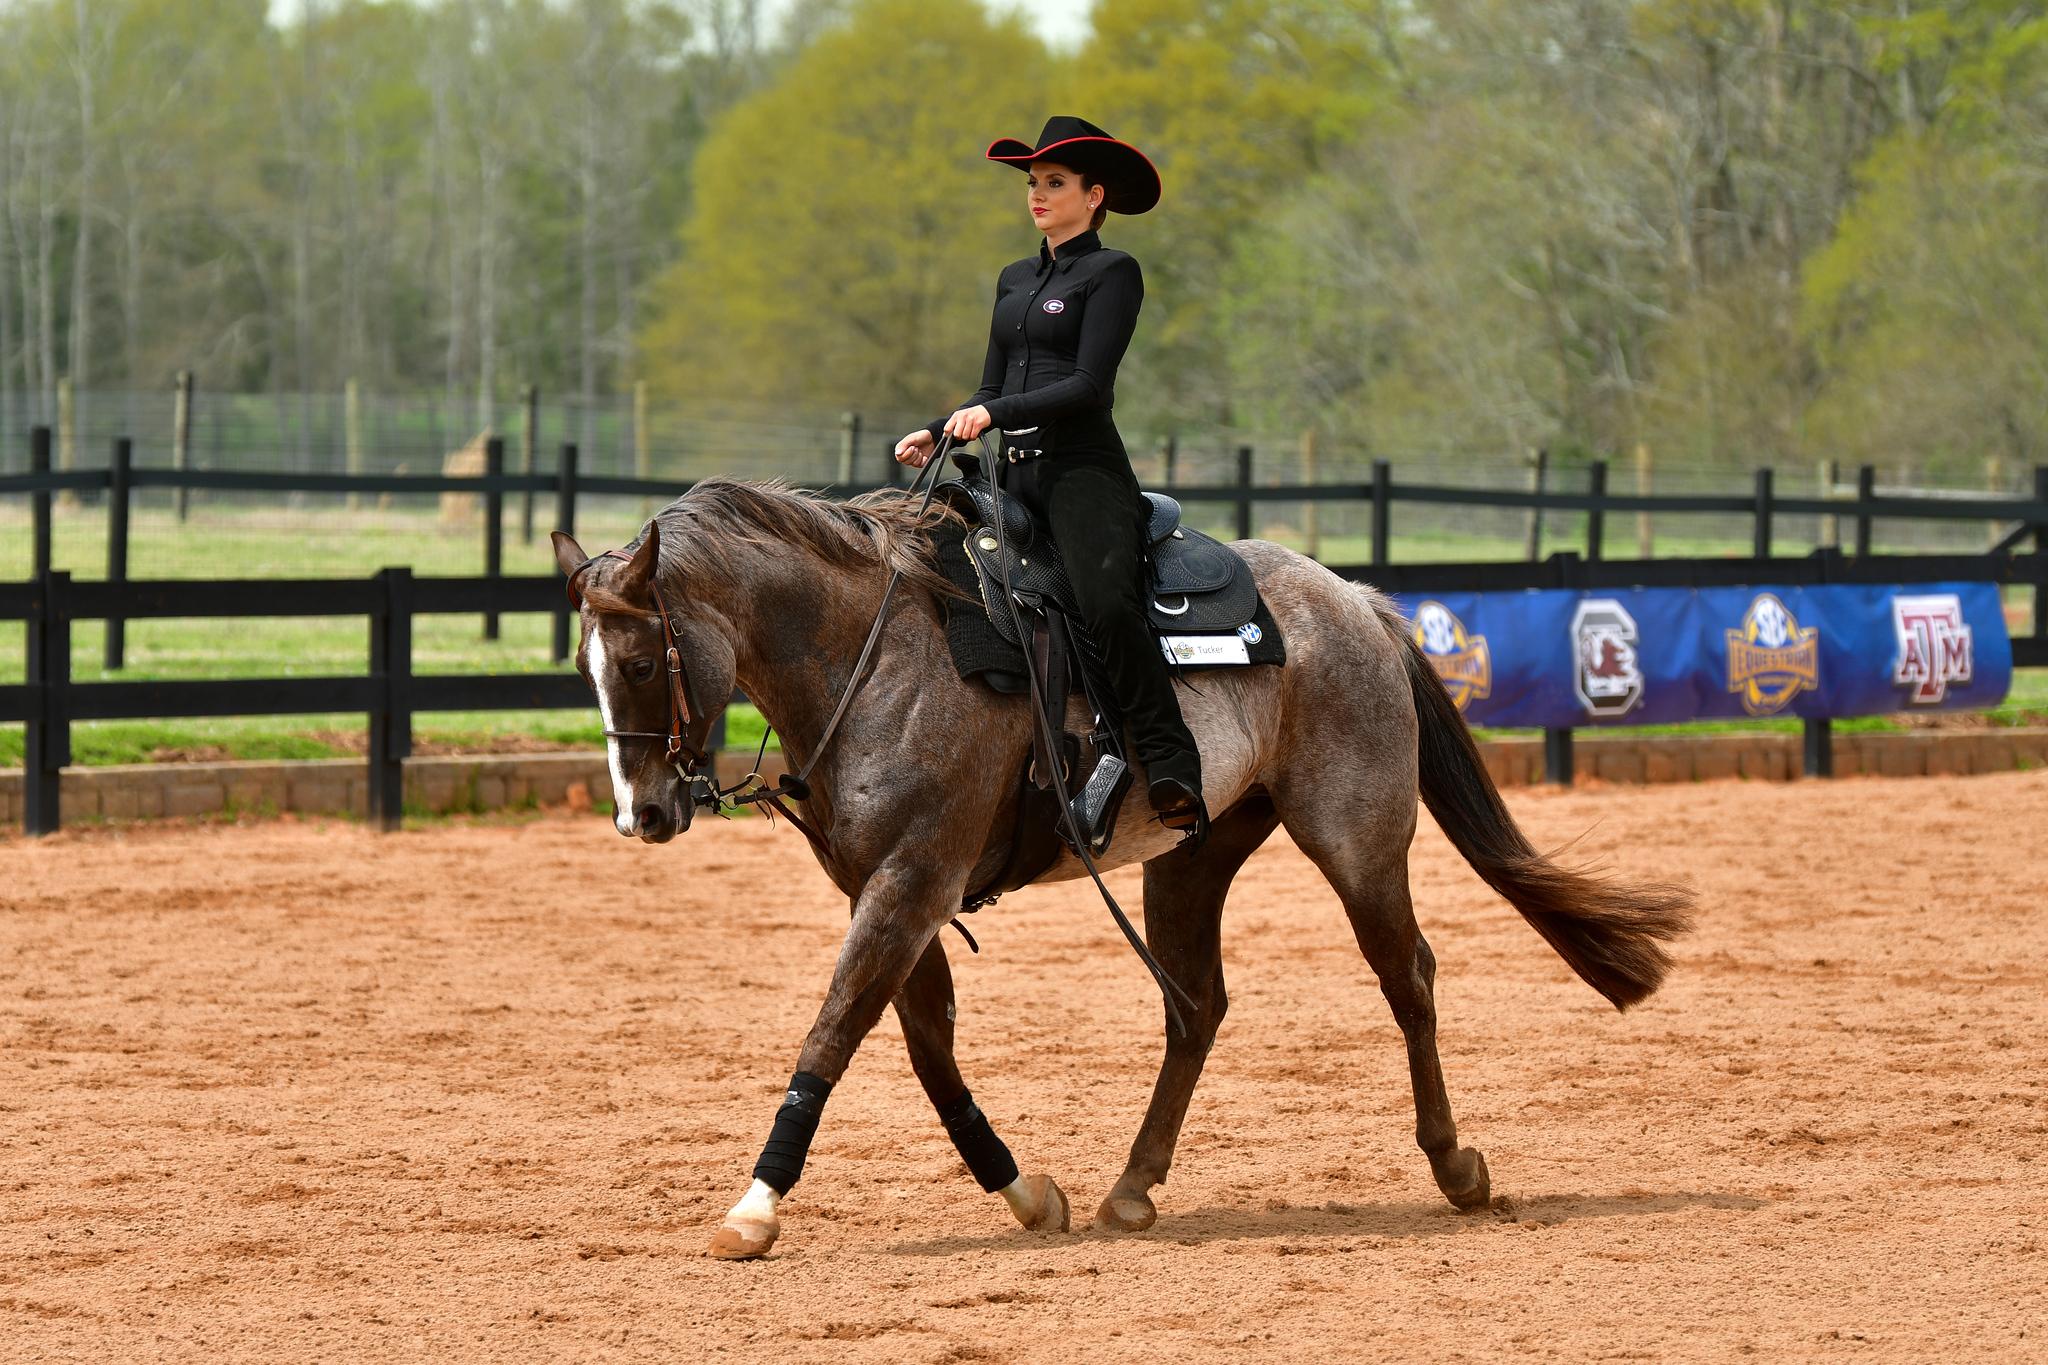 Georgia during the 2021 SEC Equestrian Championship in Bishop, Ga., on Saturday, March 27, 2021. (Photo by Rob Davis)